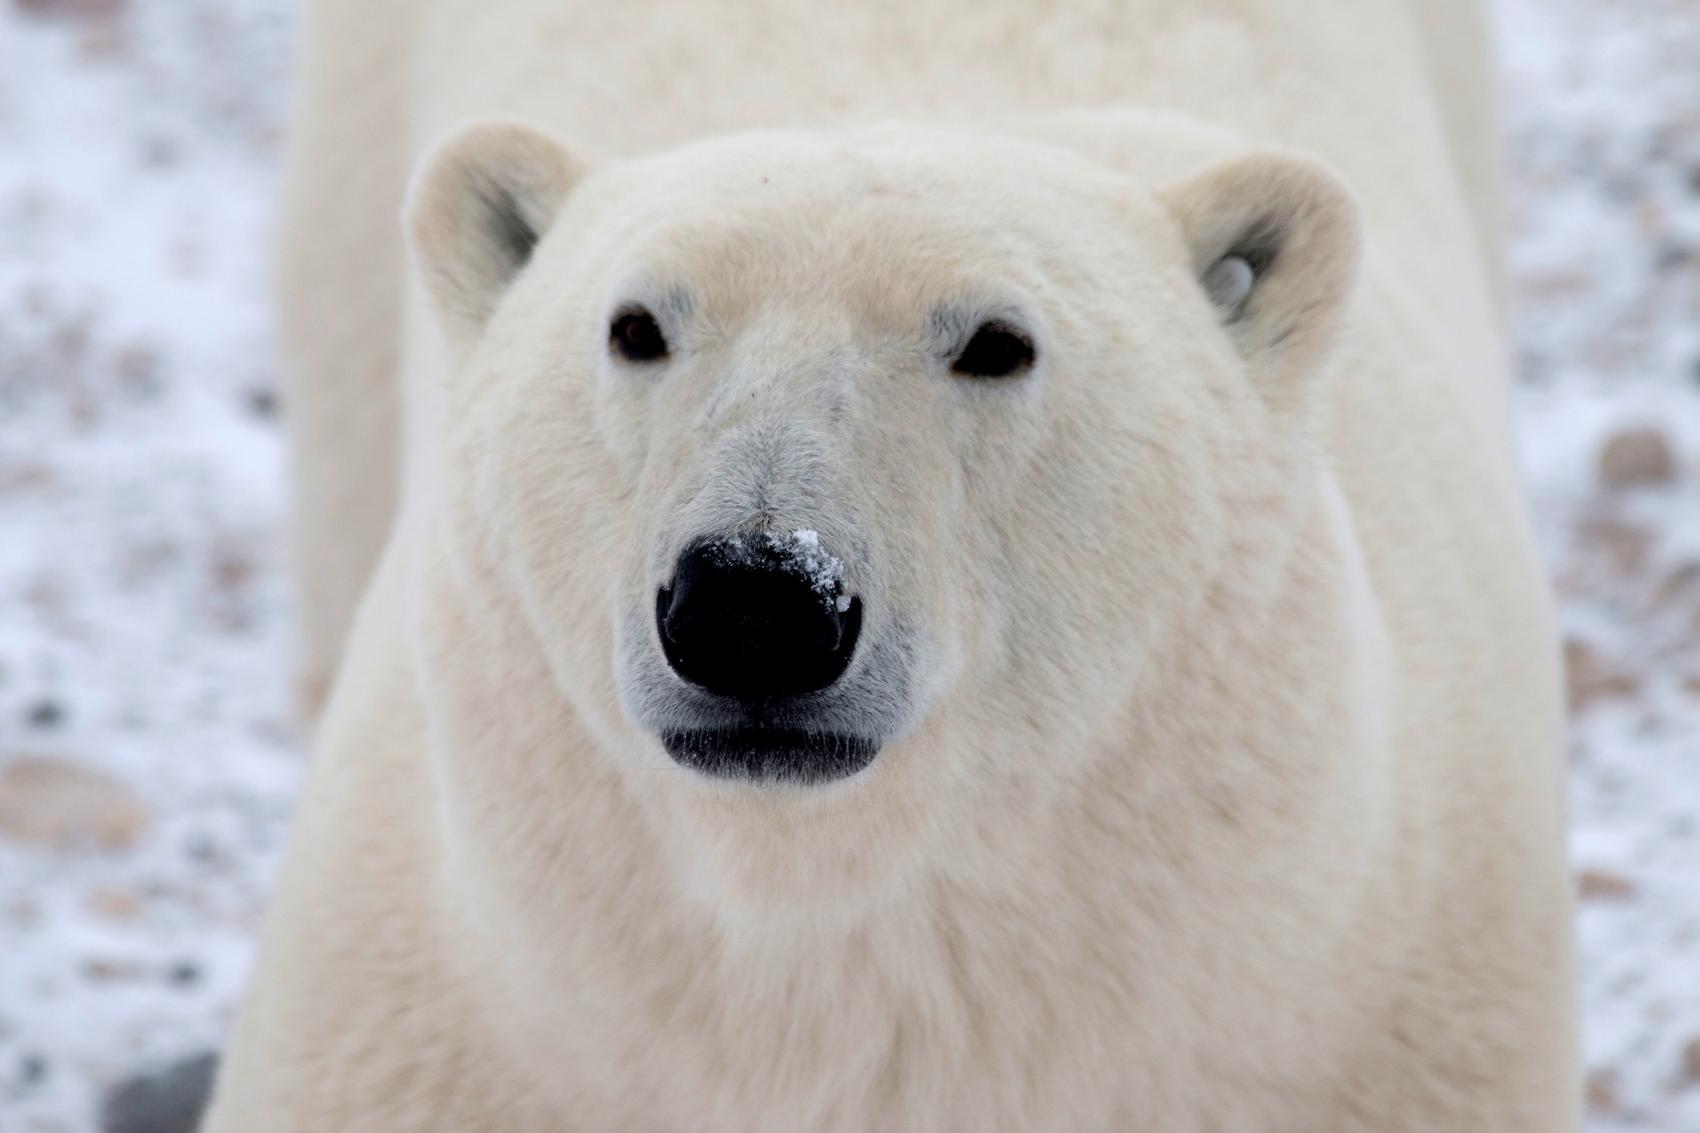 Remote Canadian town programs radar to spot approaching polar bears